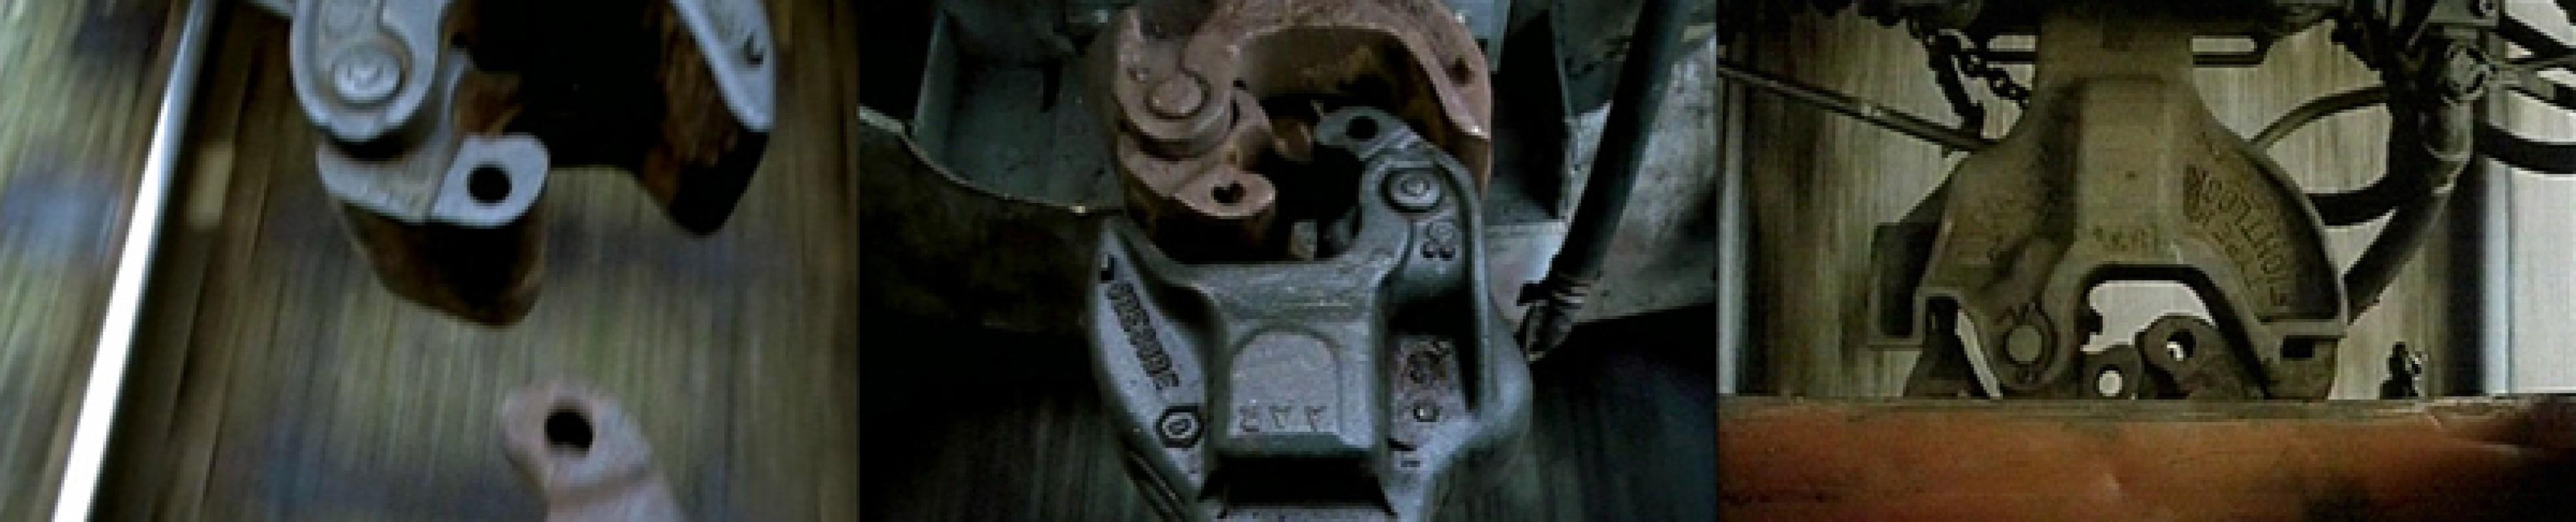 1415885806 girardet mueller locomotive 7